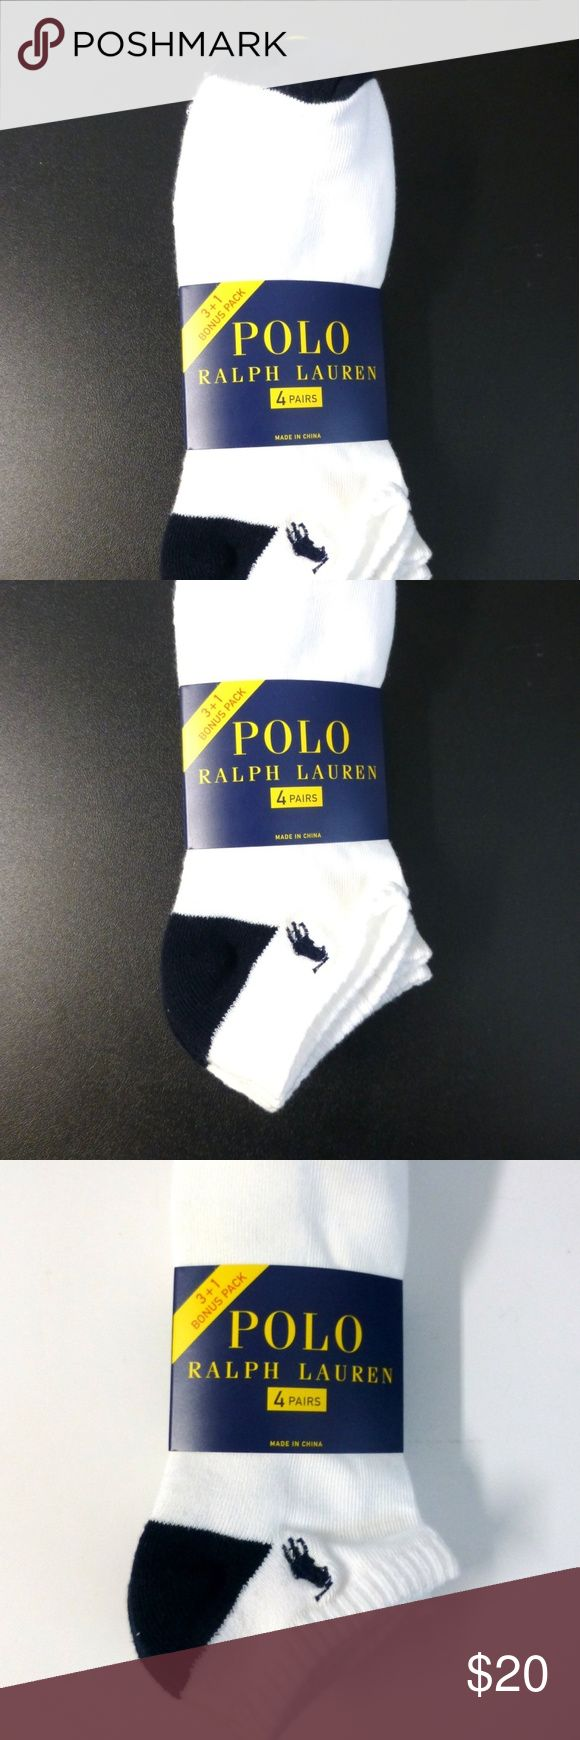 Polo Ralph Lauren 4pr 10-13 white quarter socks New in package. White quarter socks have a black heel, toe and pony logo. 98% polyester 2% spandex. Polo by Ralph Lauren Underwear & Socks Casual Socks